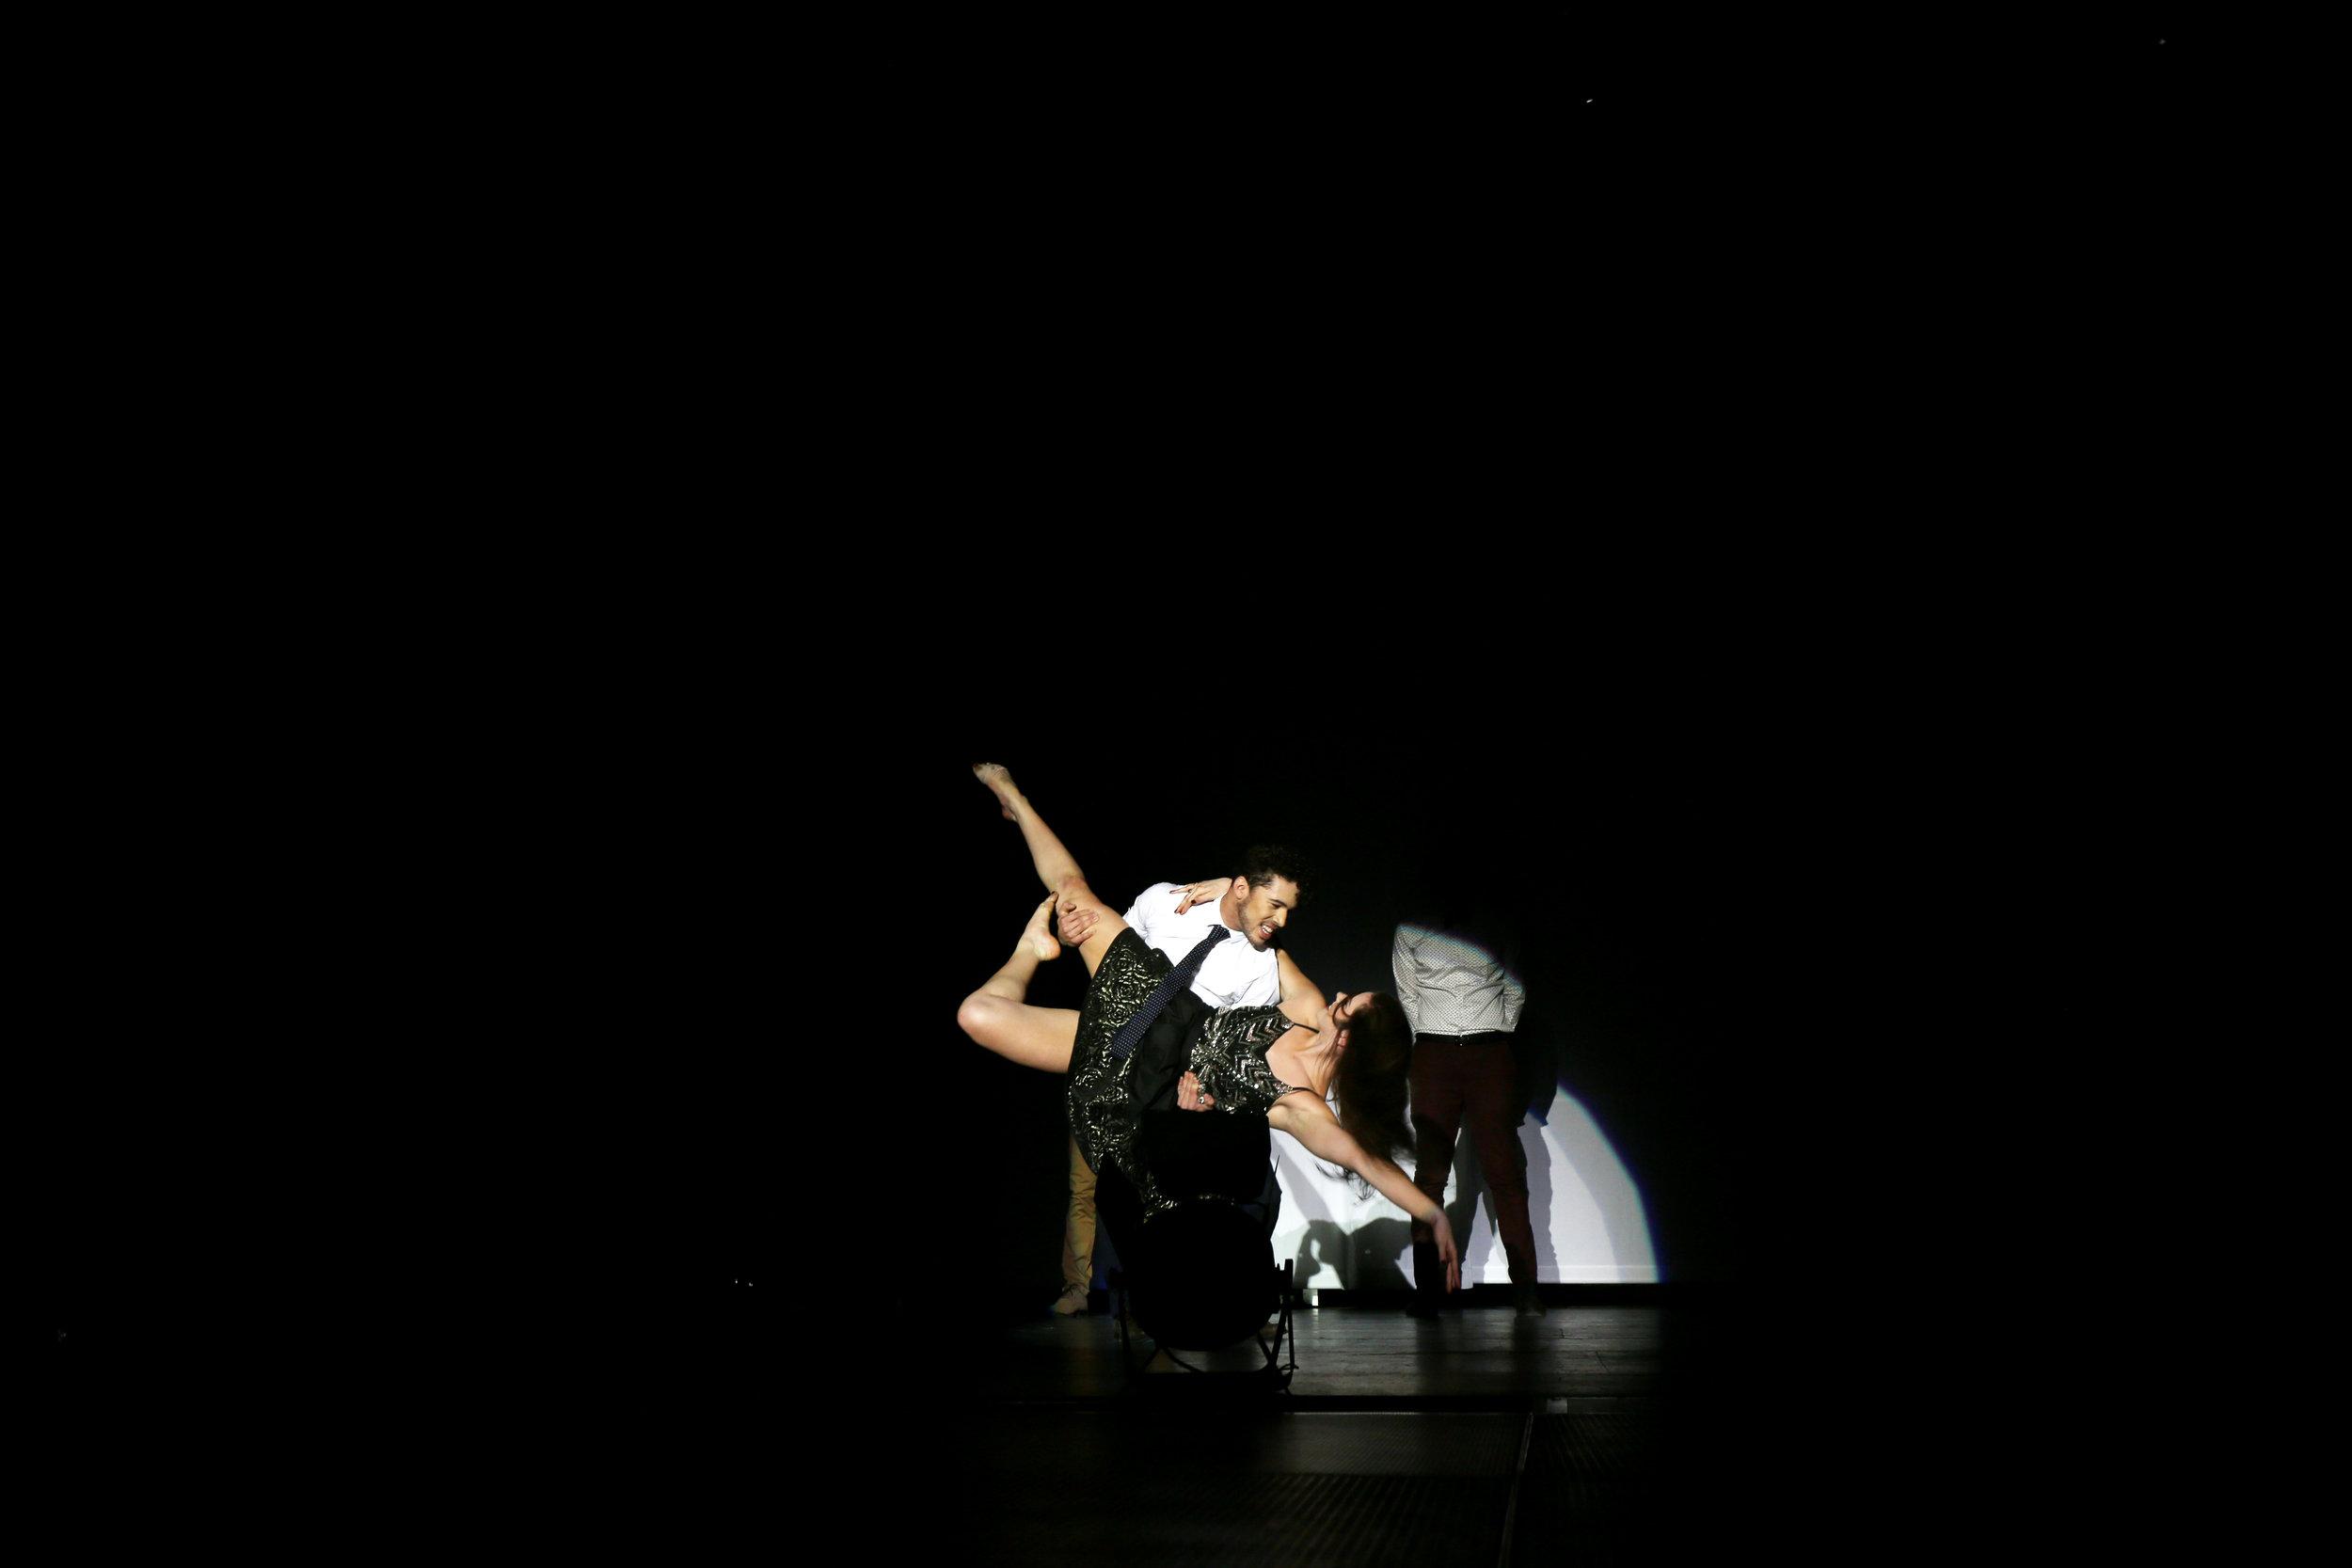 VIVIFY+caisa+fashion+show+2015 dancers.jpg